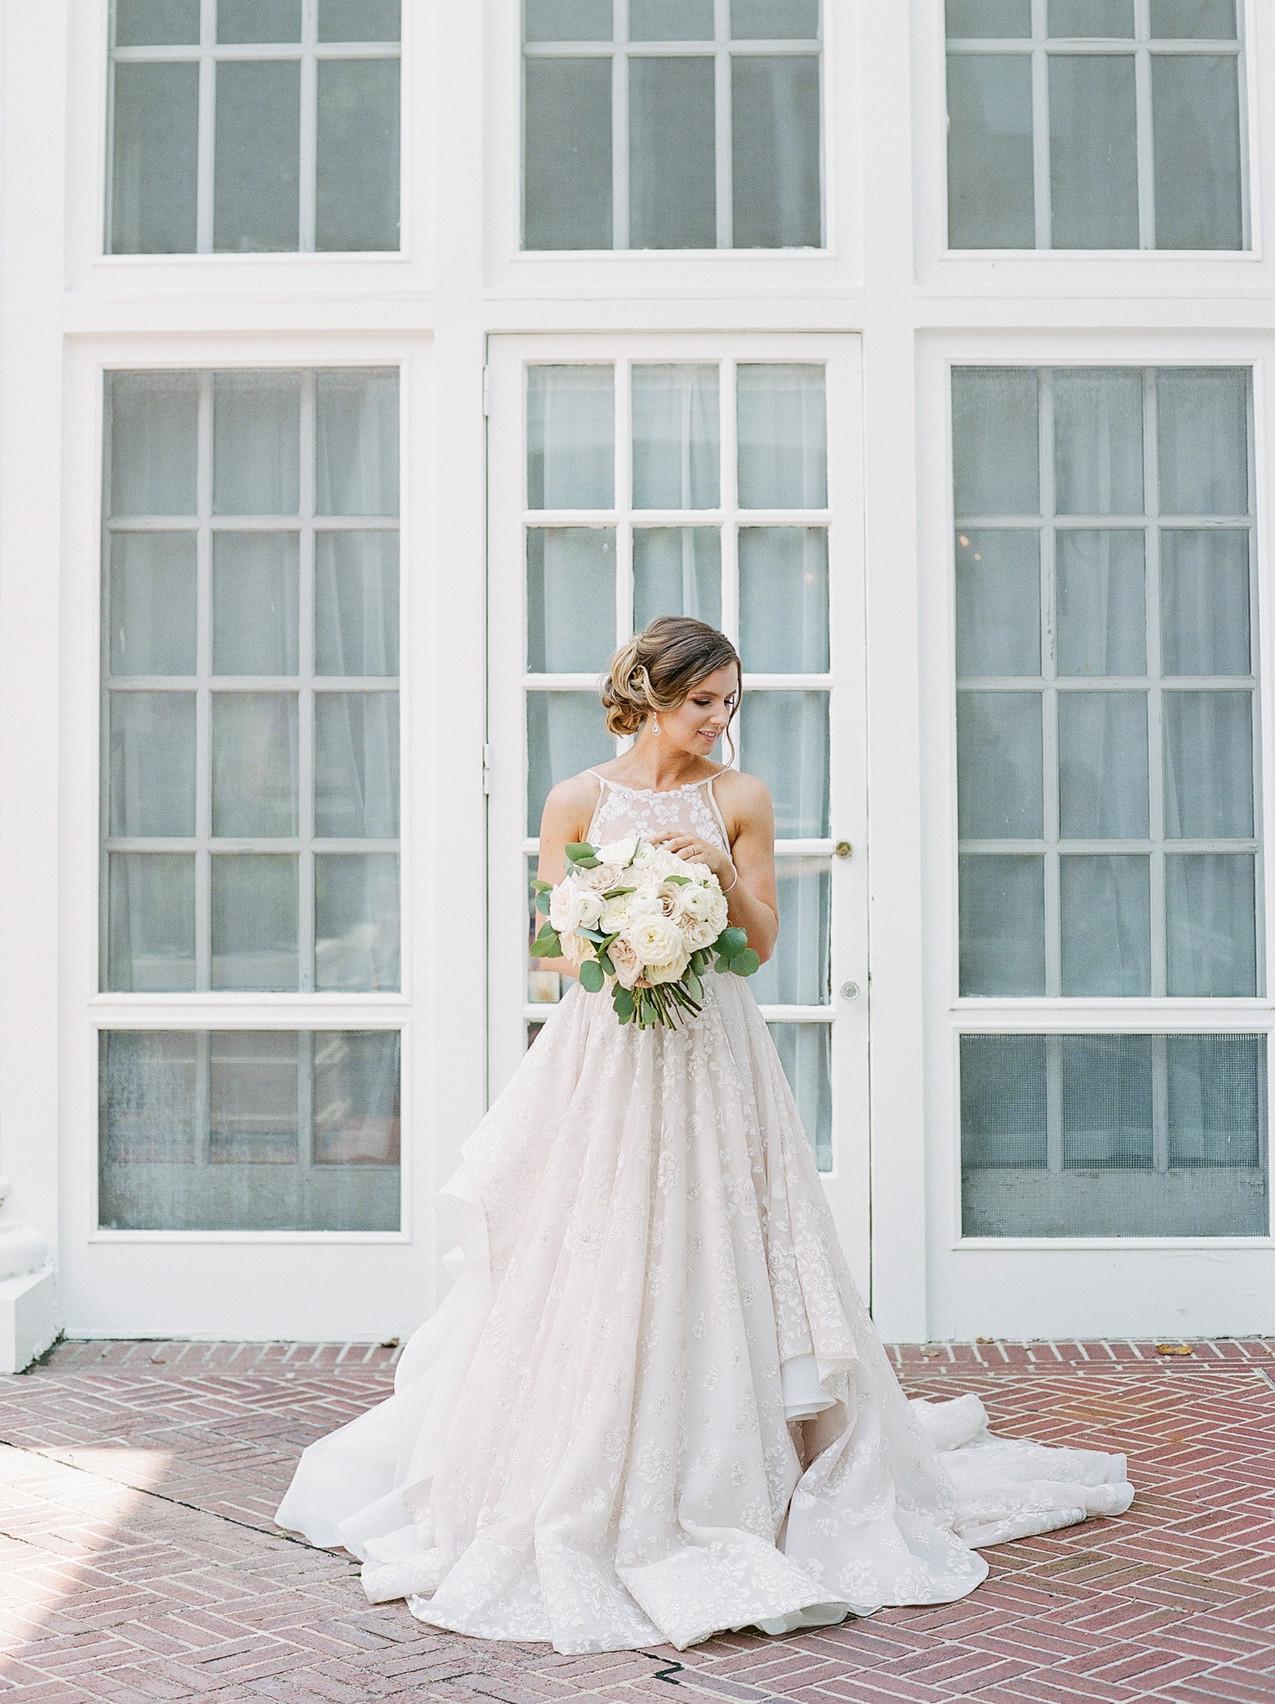 SoHo Event Design wedding planner Duke Mansion wedding bride and groom